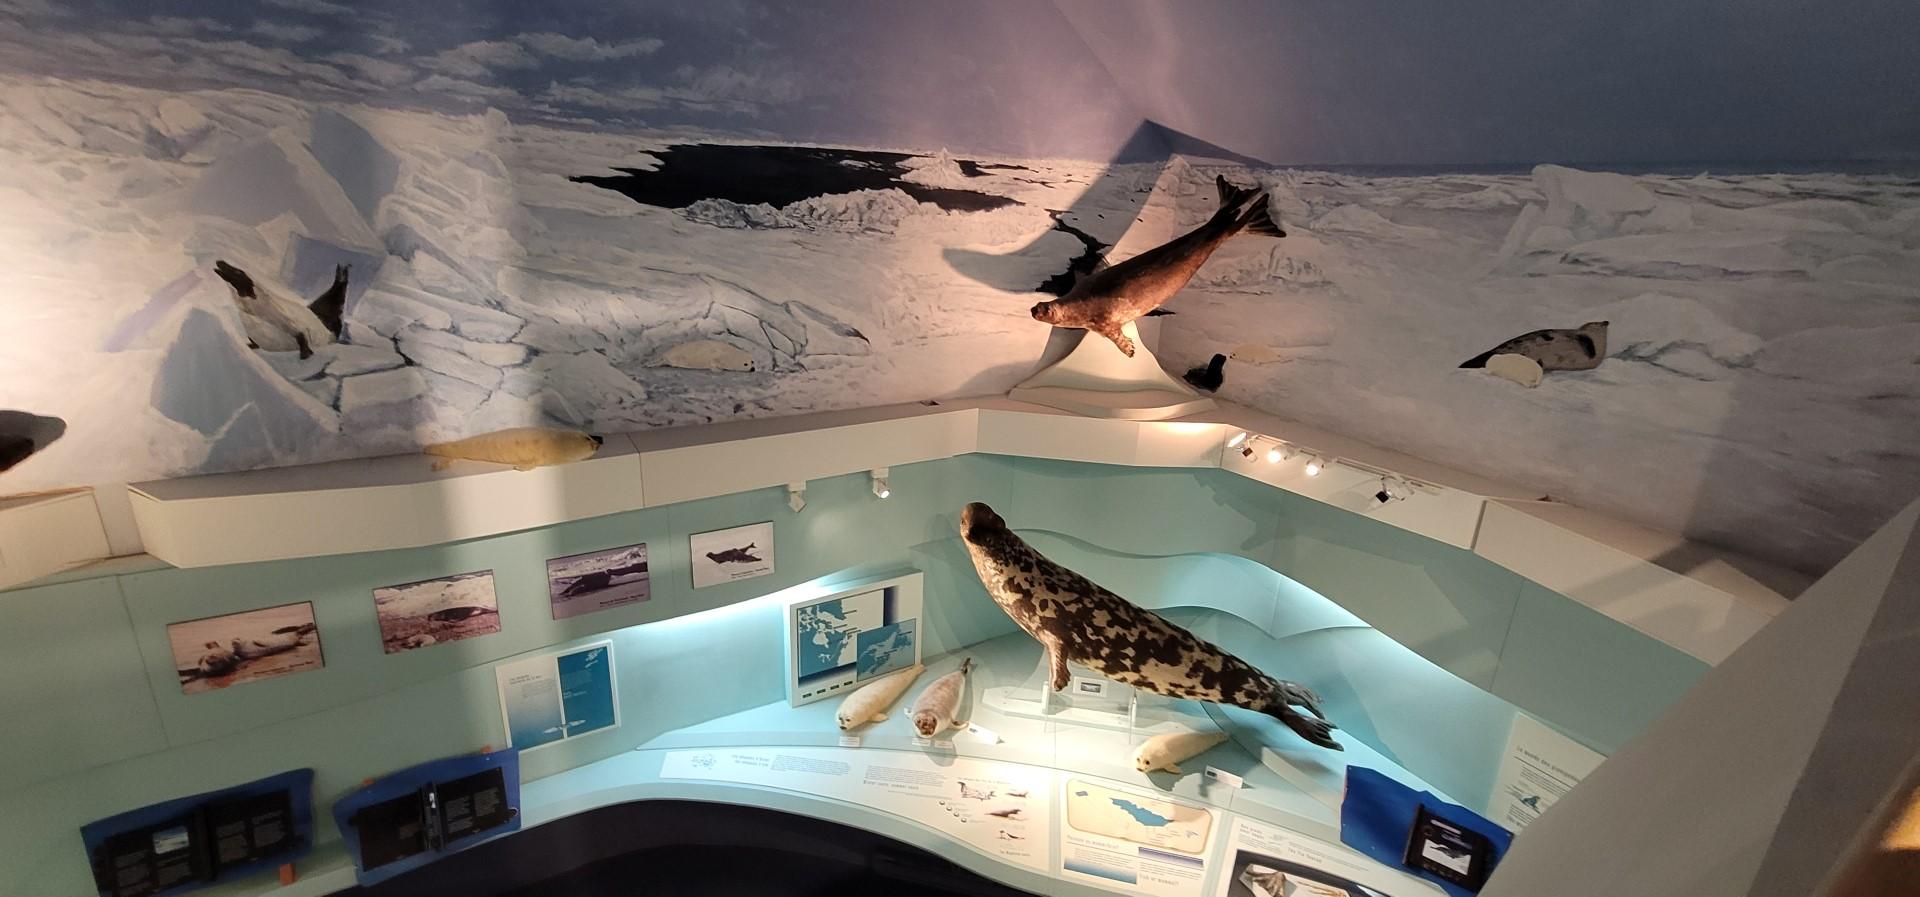 SEAL display at seal observatory on Magdalen Islands